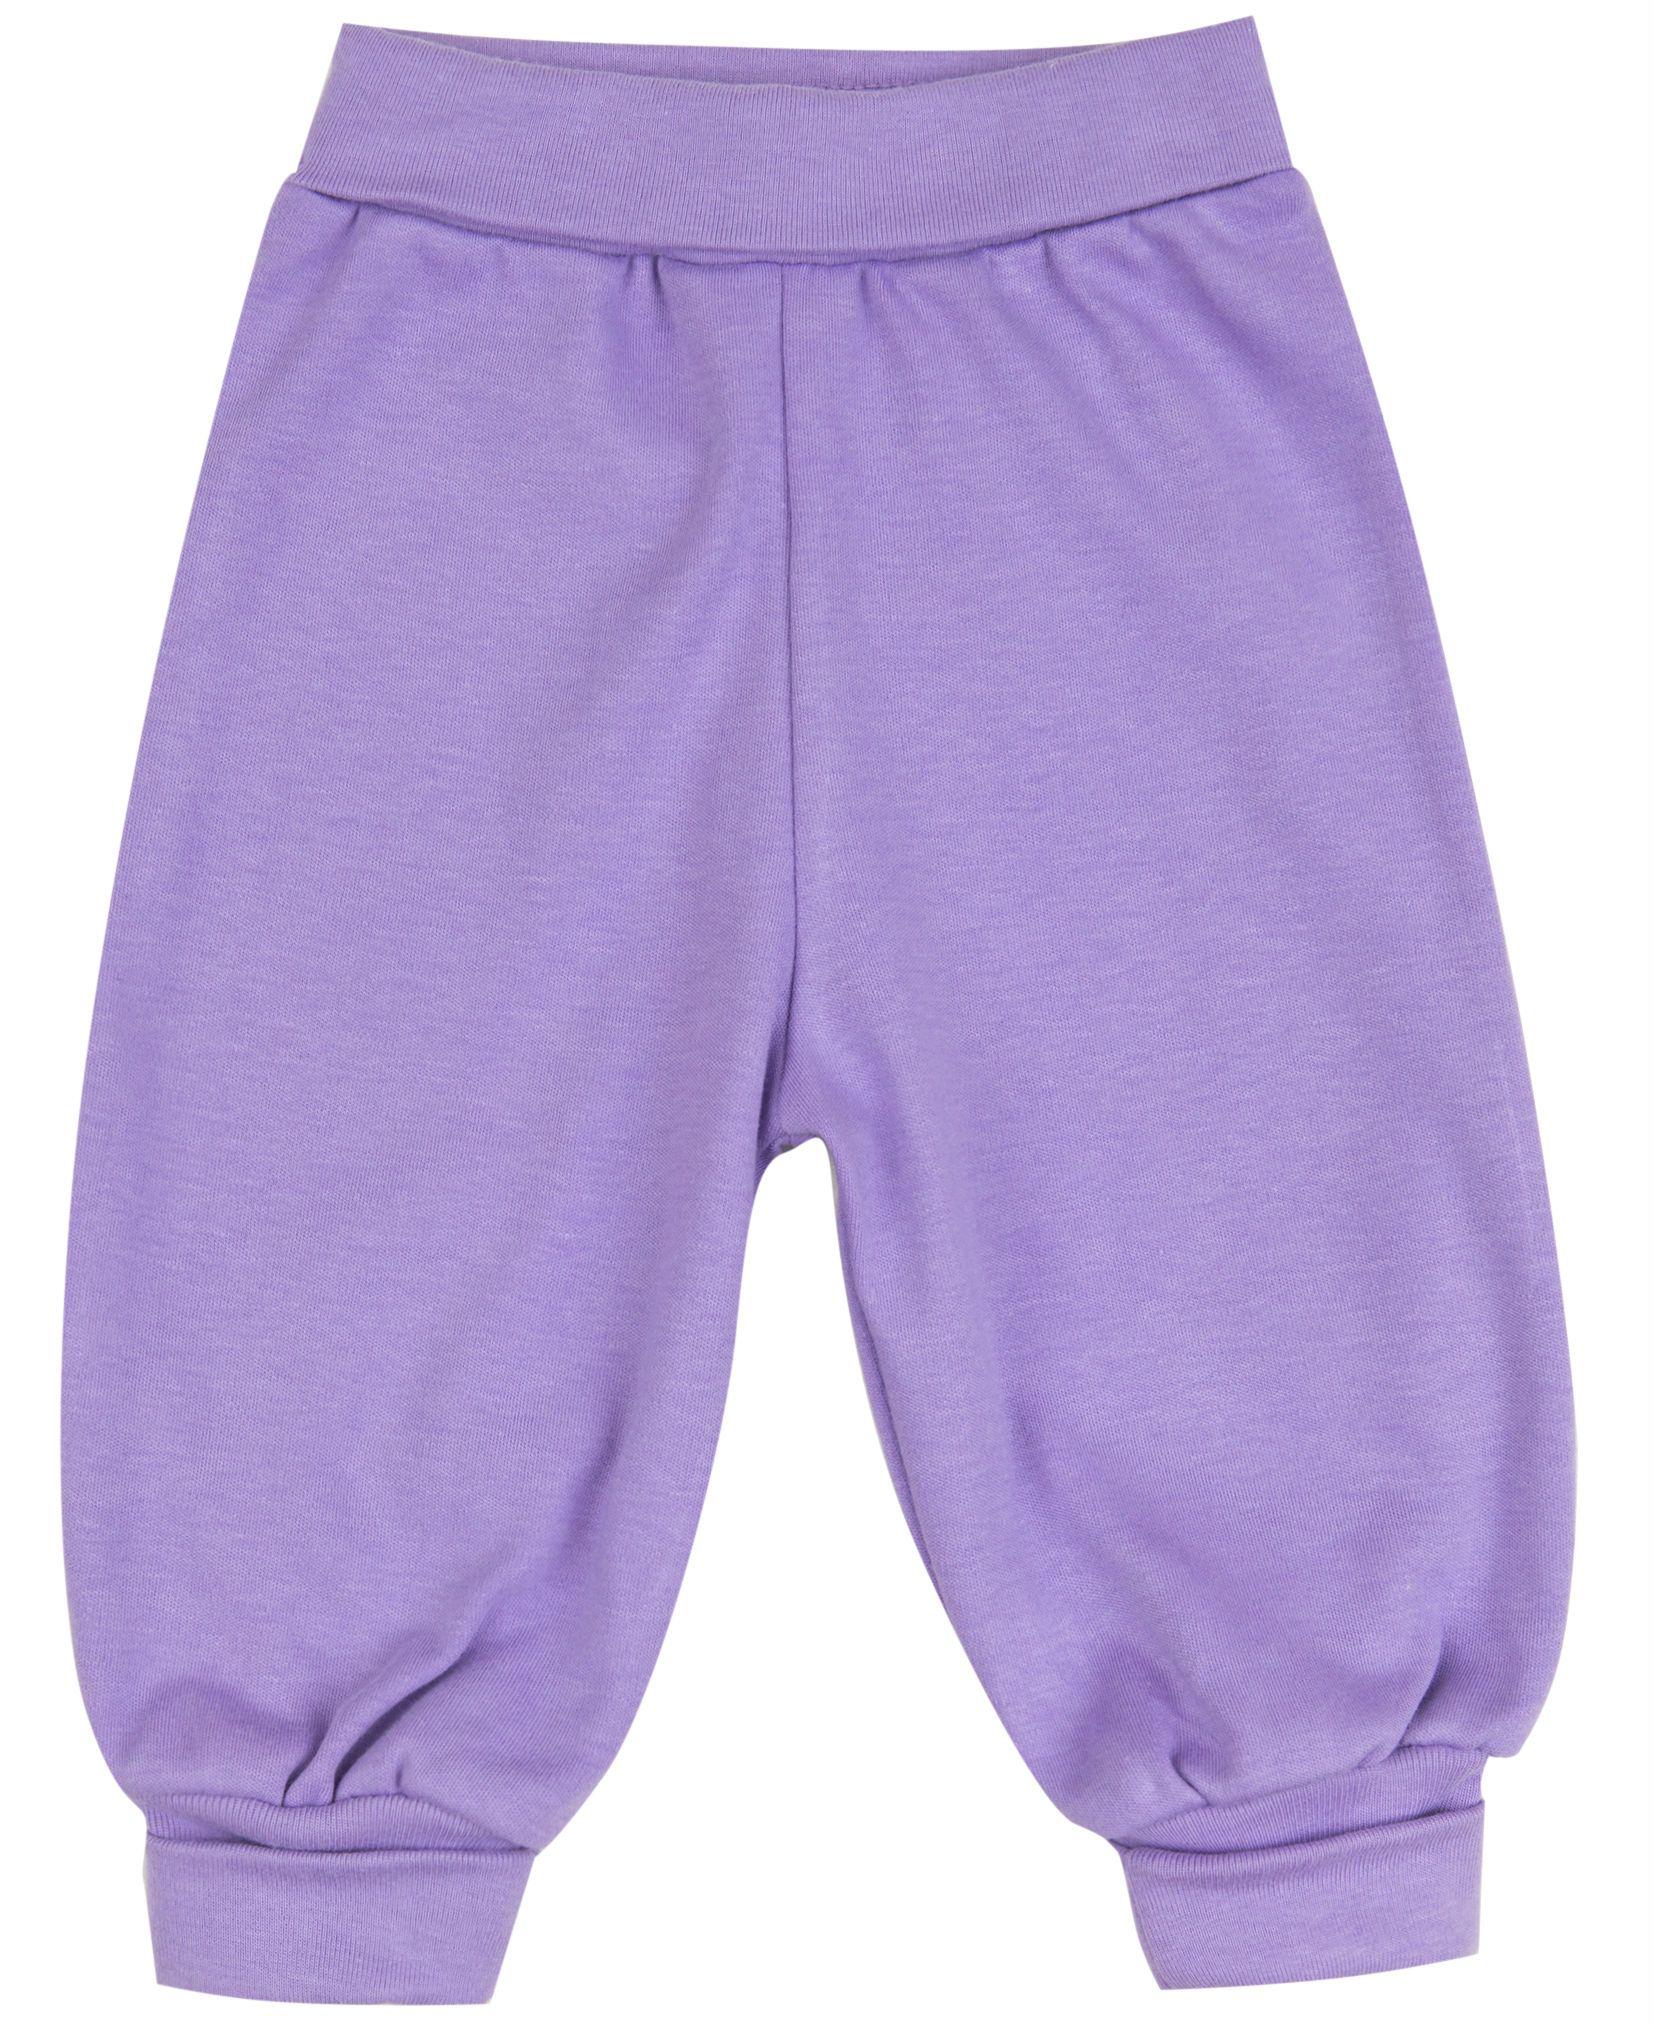 Image of Sweat Pants fra Joha - Lavendel (20610-28-15114)